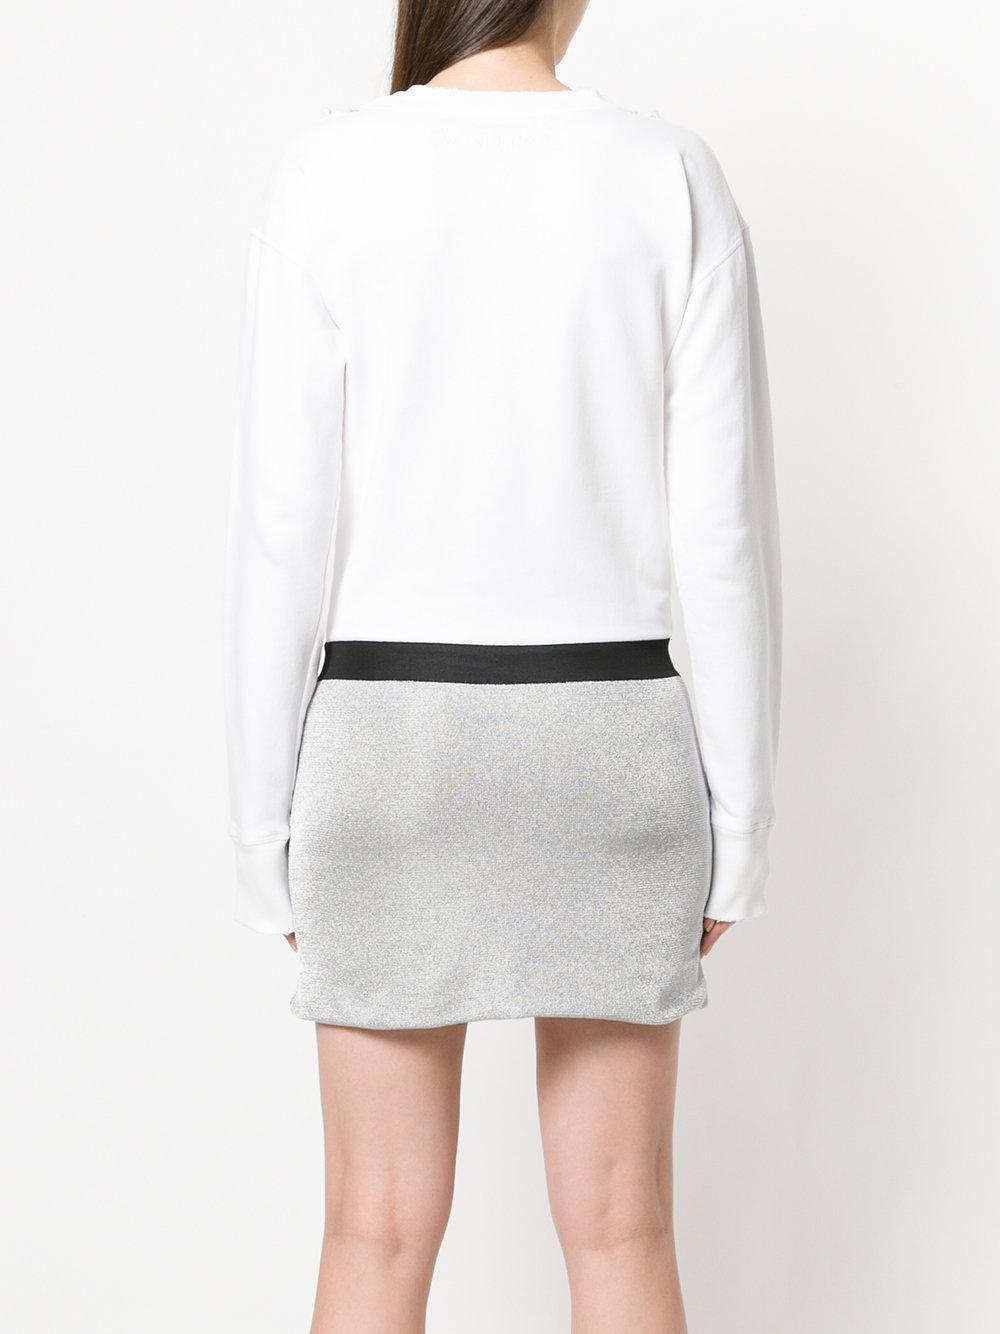 JW Anderson distressed detail mini dress Cheap Sale New Arrival z0ioyl